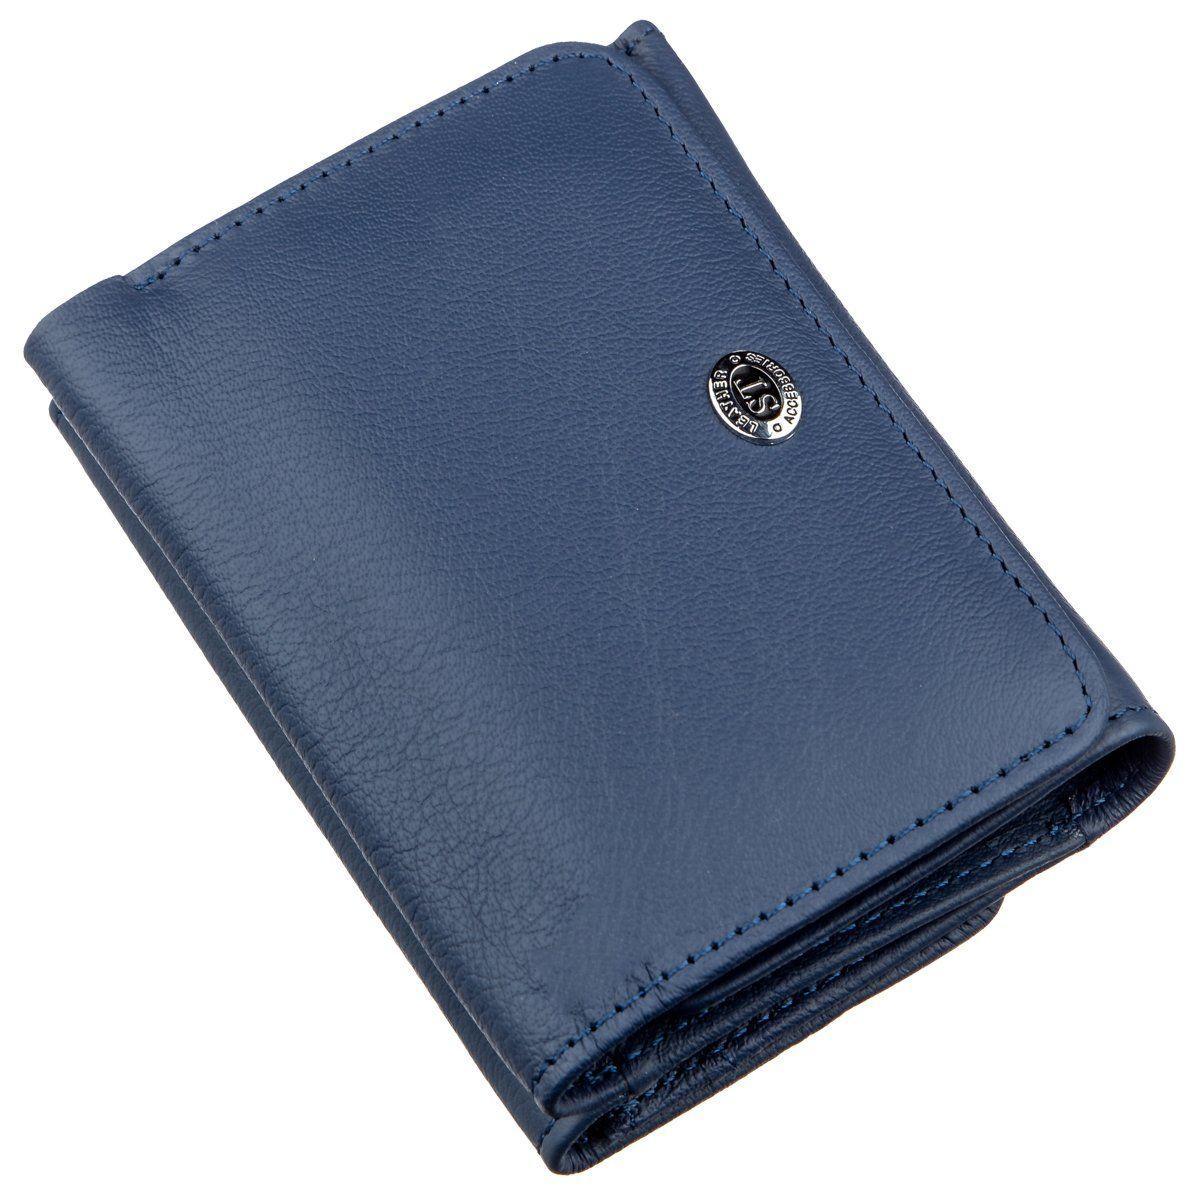 Небольшой женский кошелек ST Leather 18884 Синий